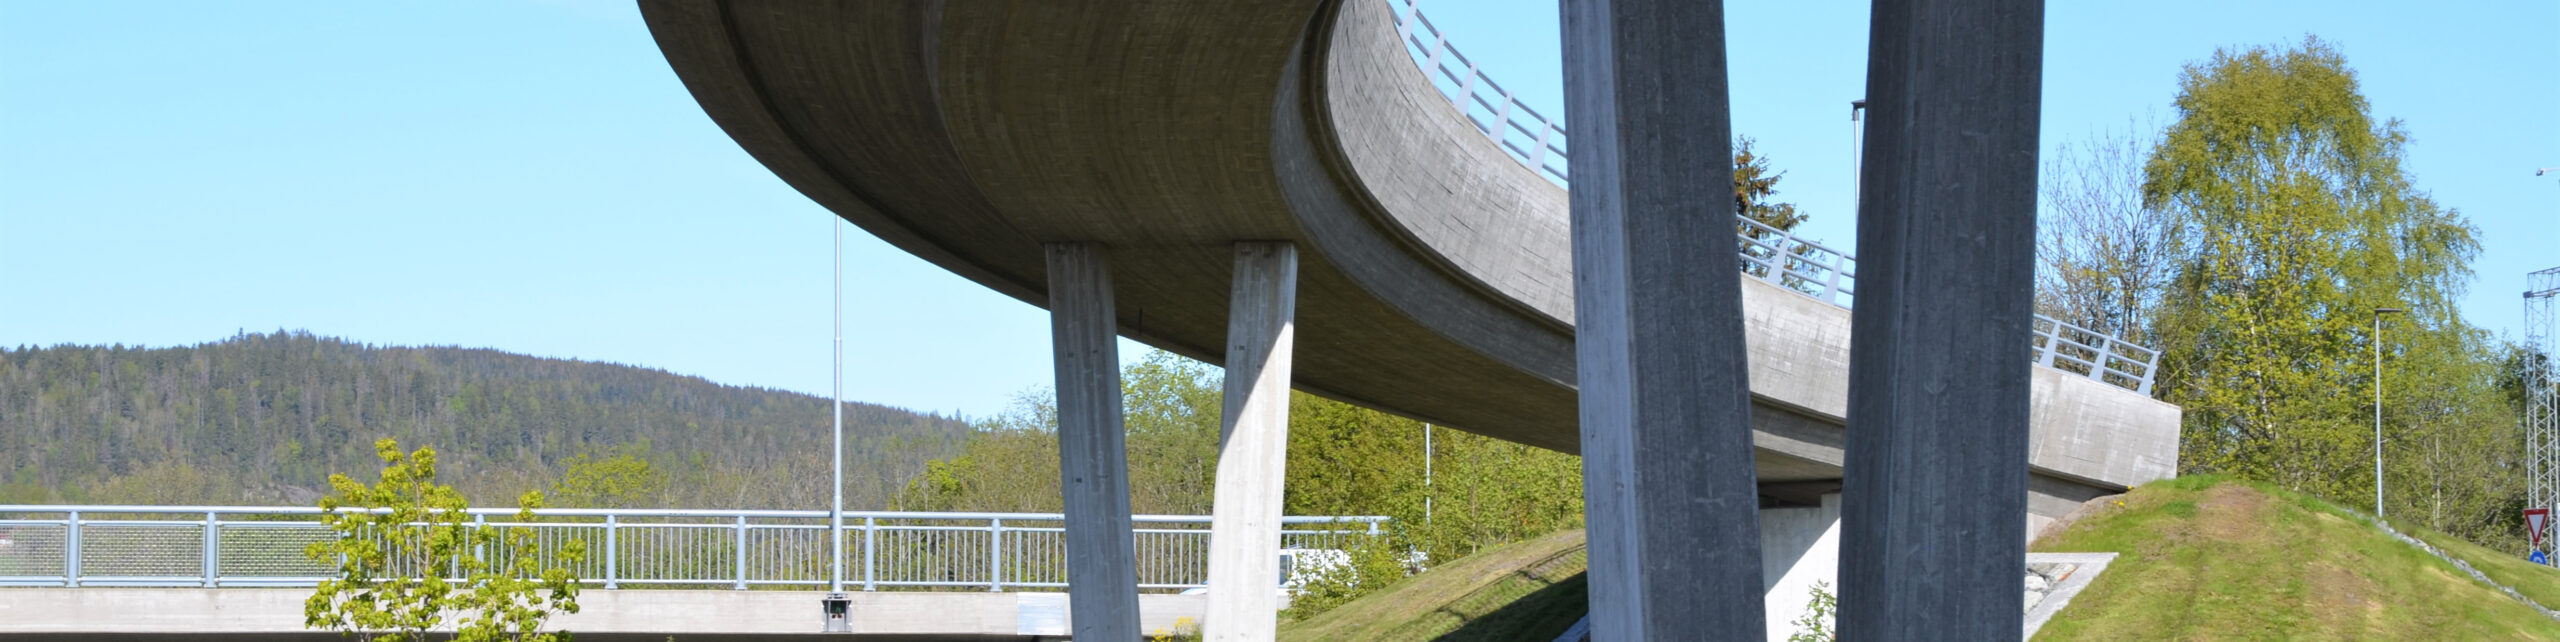 E16 Vøyenenga